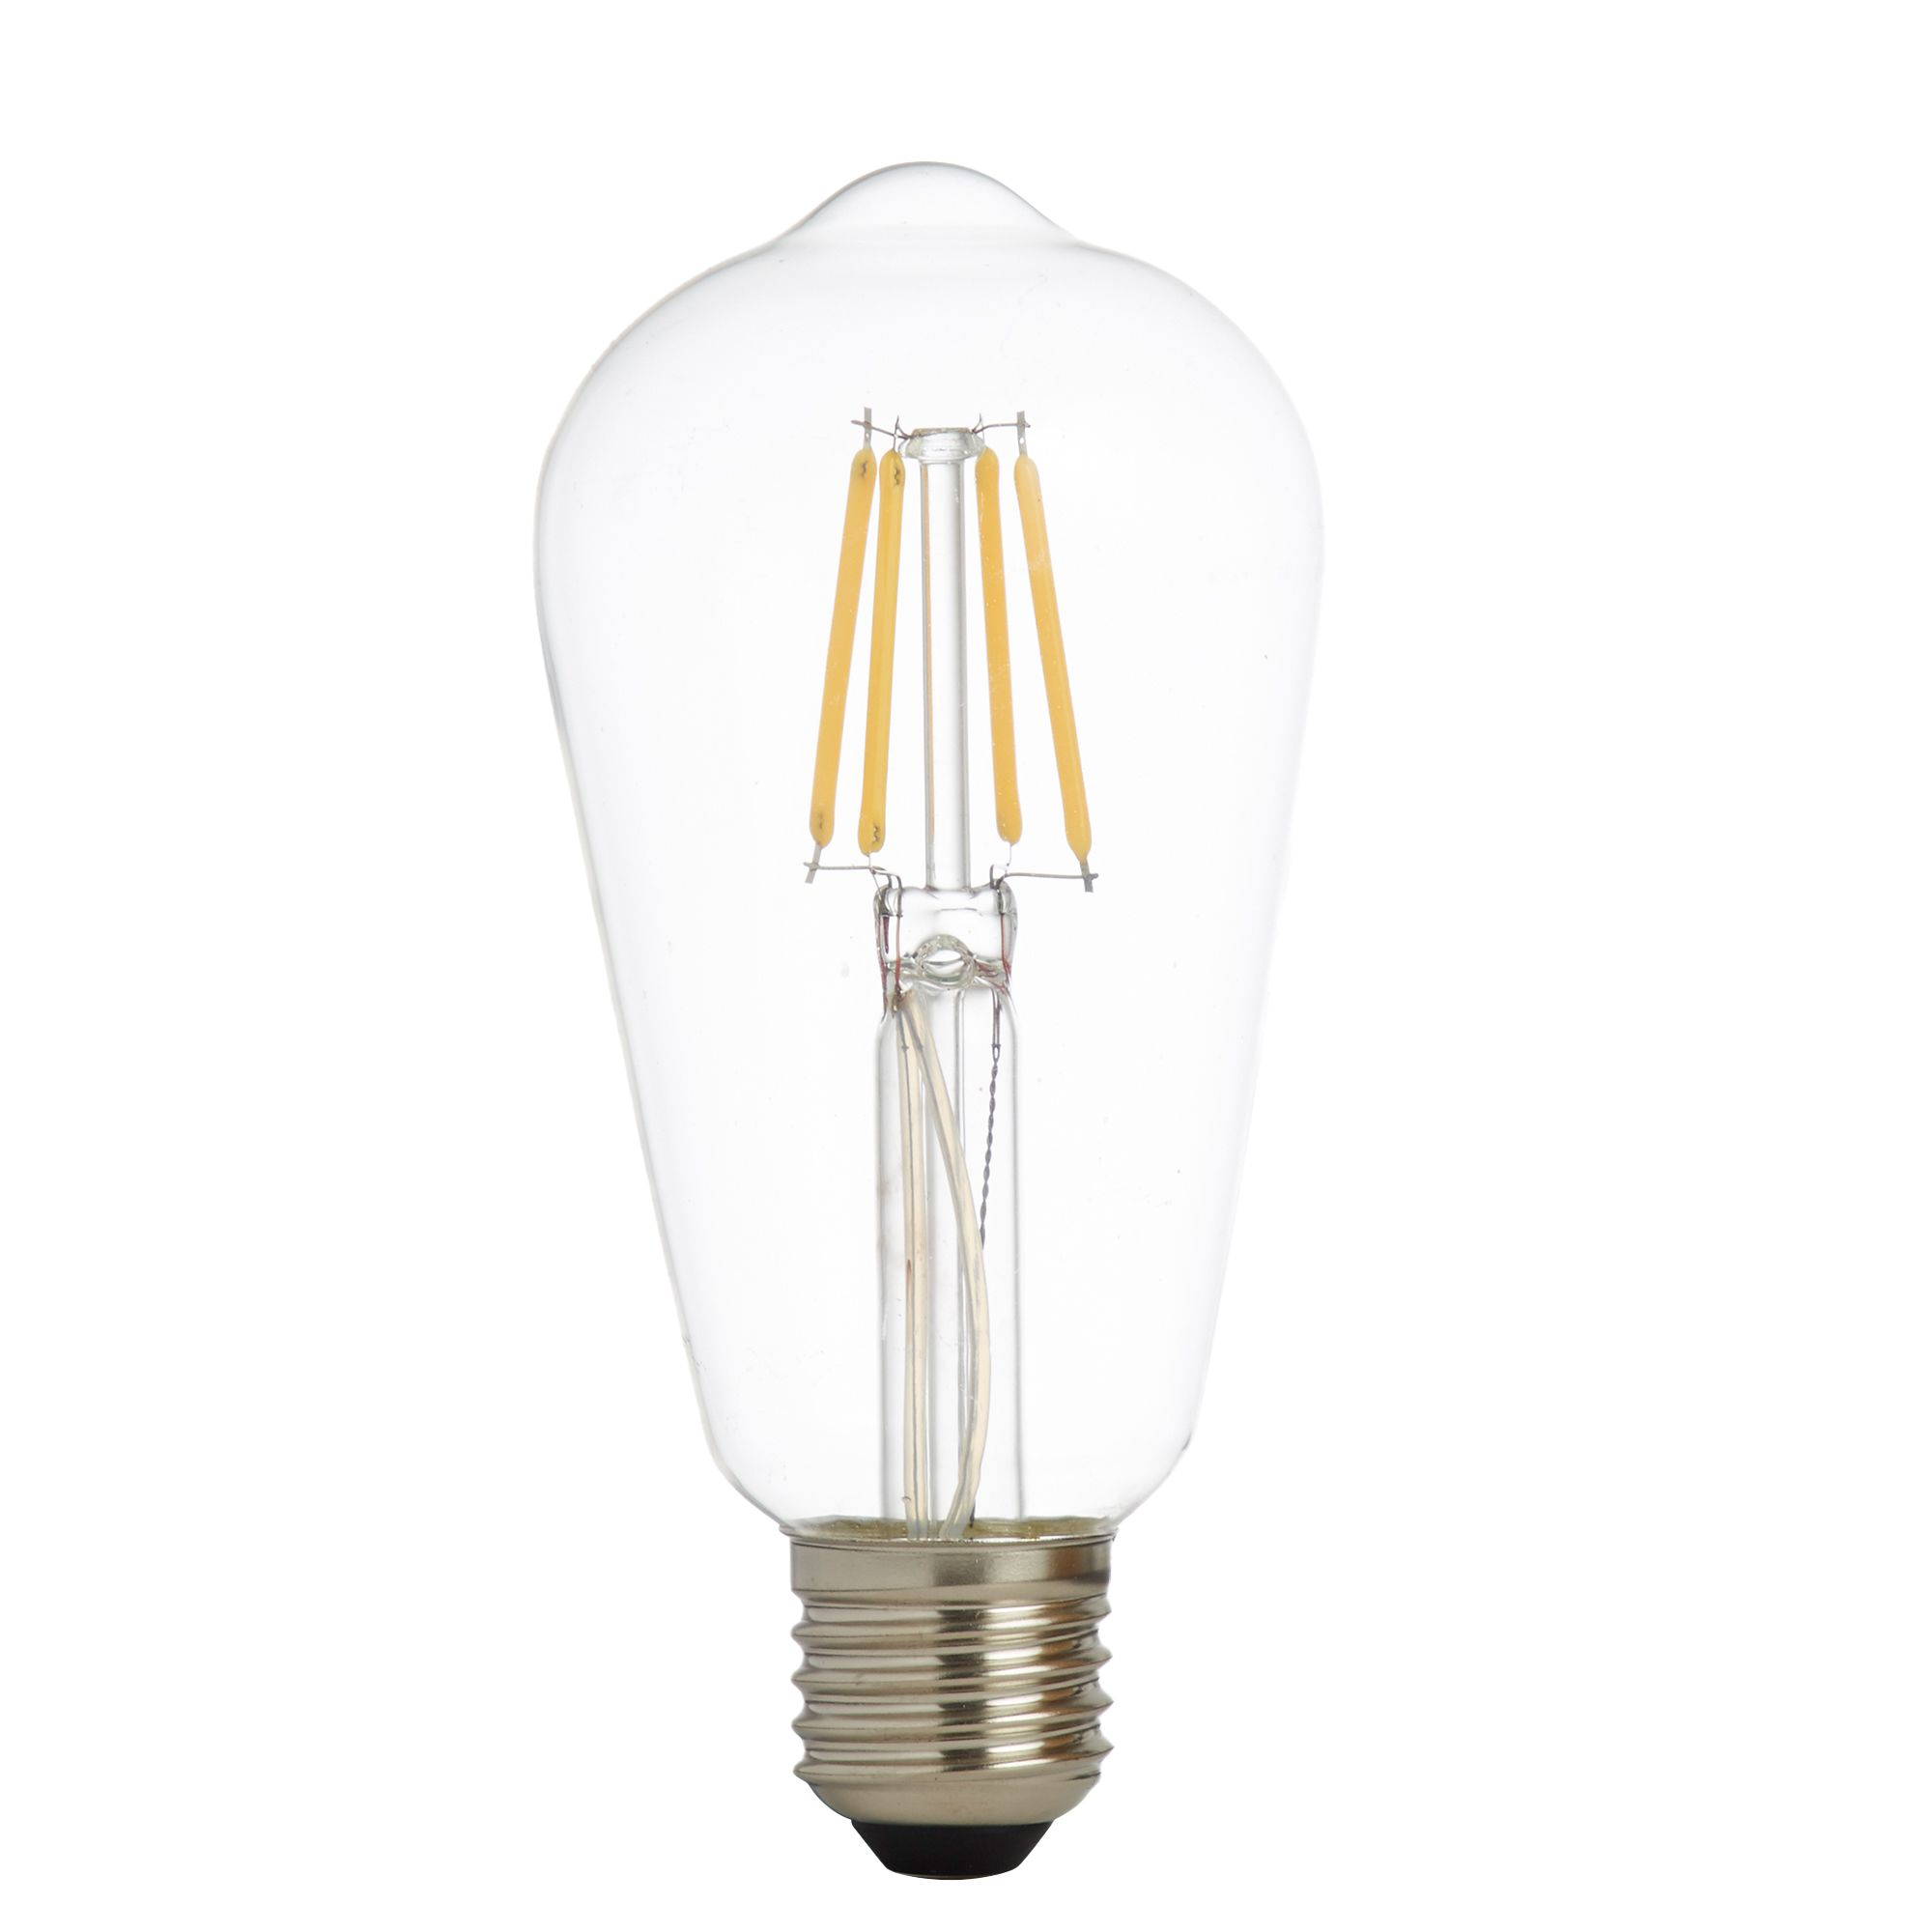 Pack X 5 - Led Filament Squirrel Lamp, Clear Glass, E27 6w, 600lm 3000k